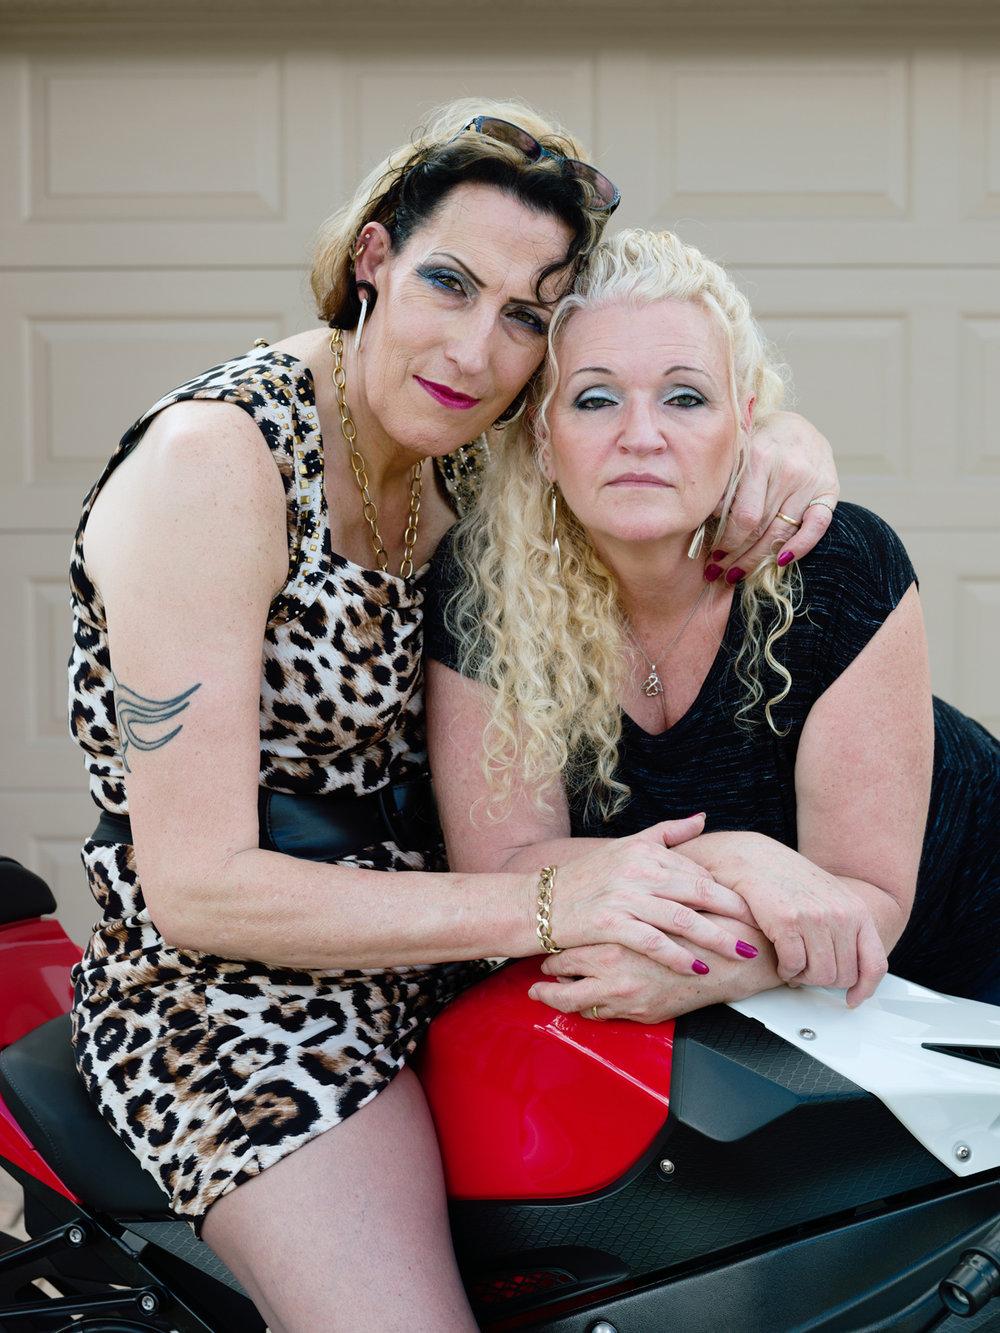 SueZie, 51, and Cheryl, 55, Valrico, FL,  2015 © Jess T. Dugan